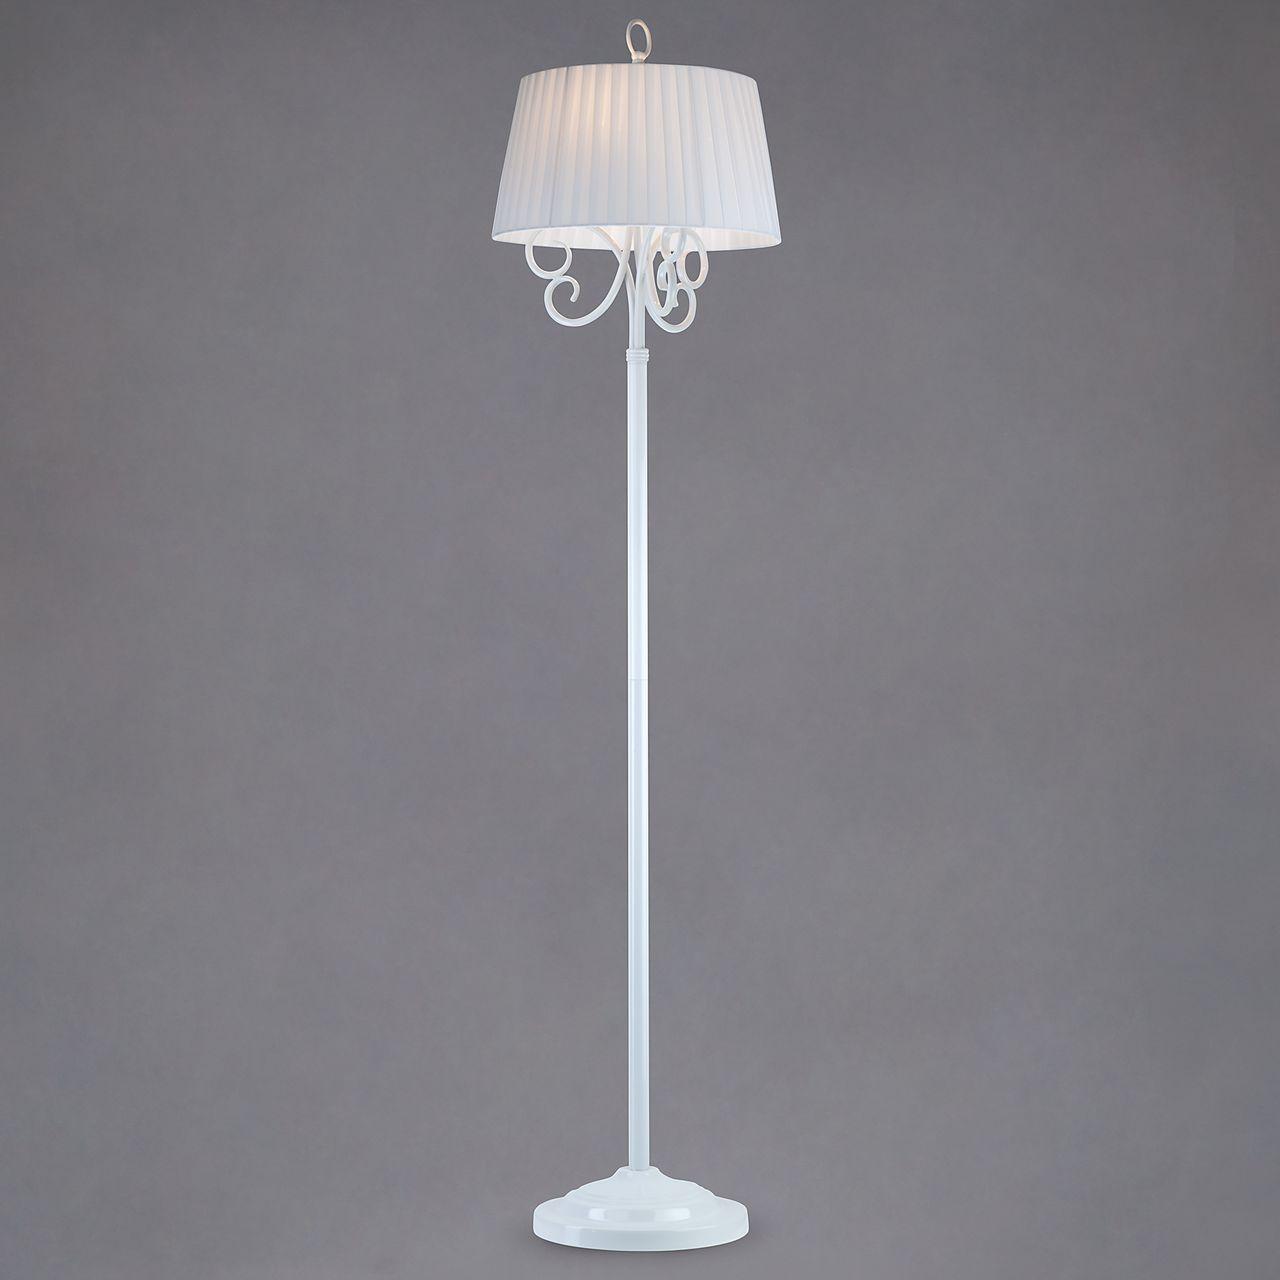 Торшер Bogates Severina 01090/3 лампа настольная декоративная bogates 01090 1